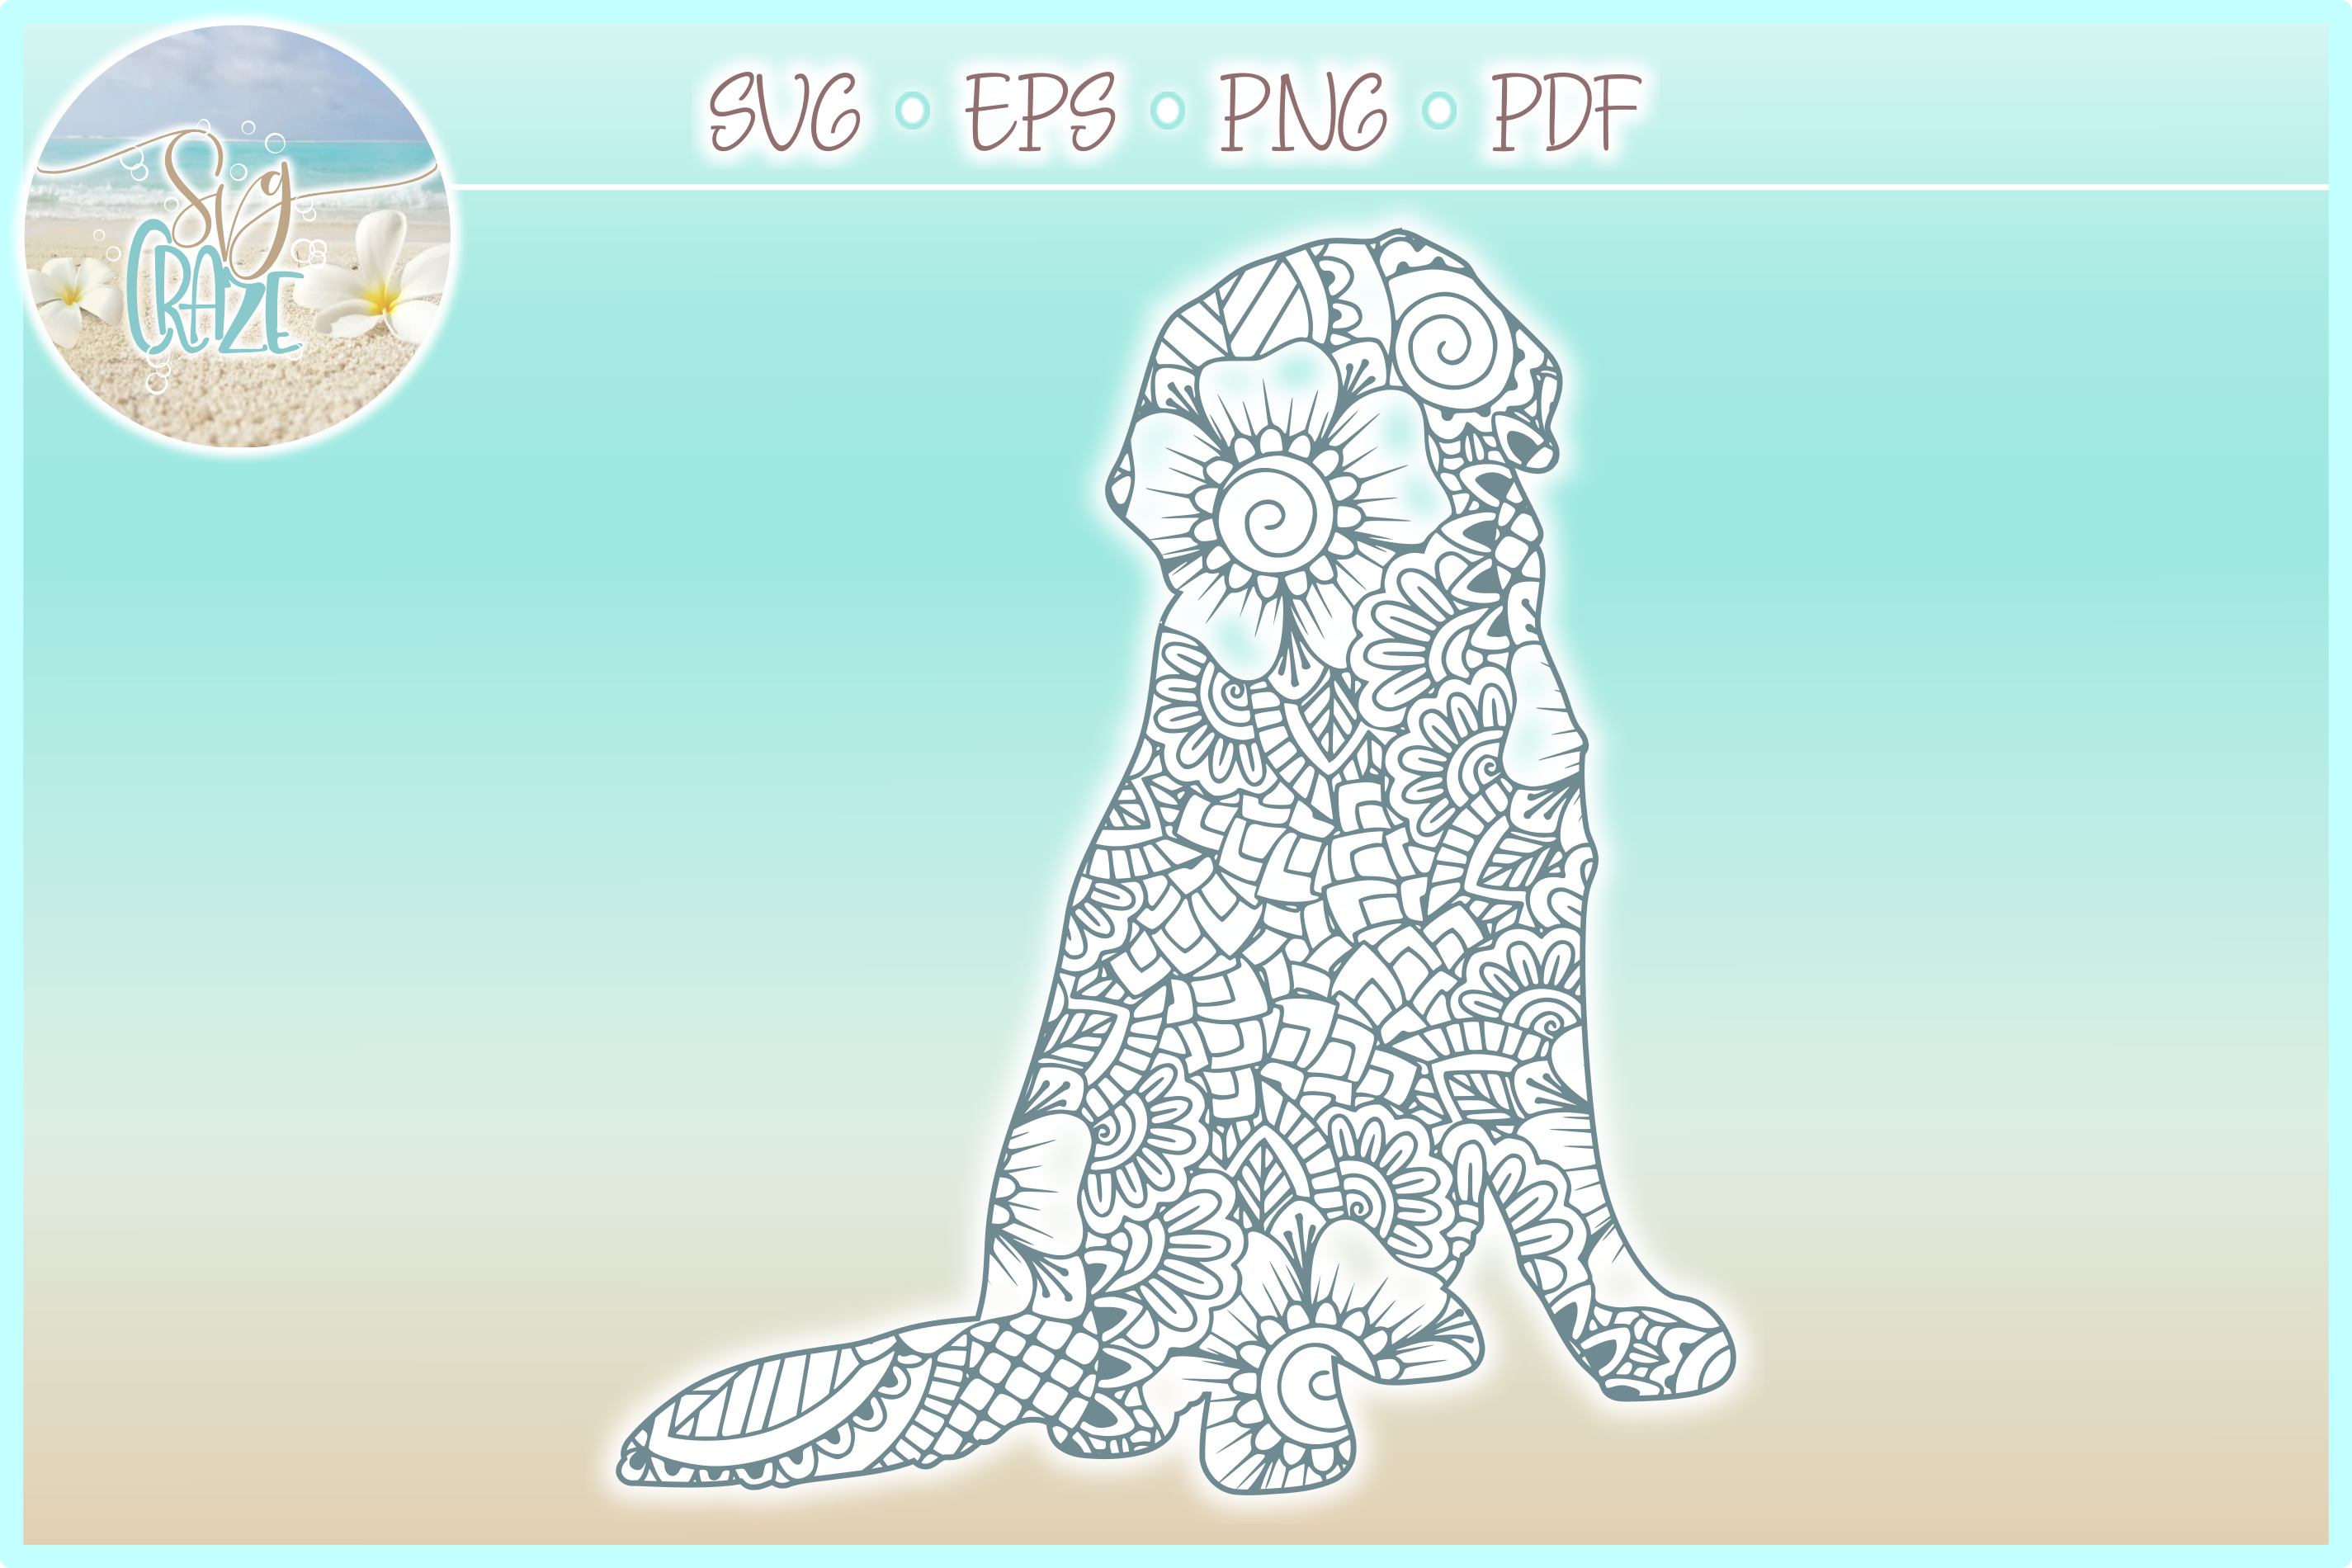 Golden Retriever Mandala Zentangle Bundle SVG Eps Png PDF example image 5